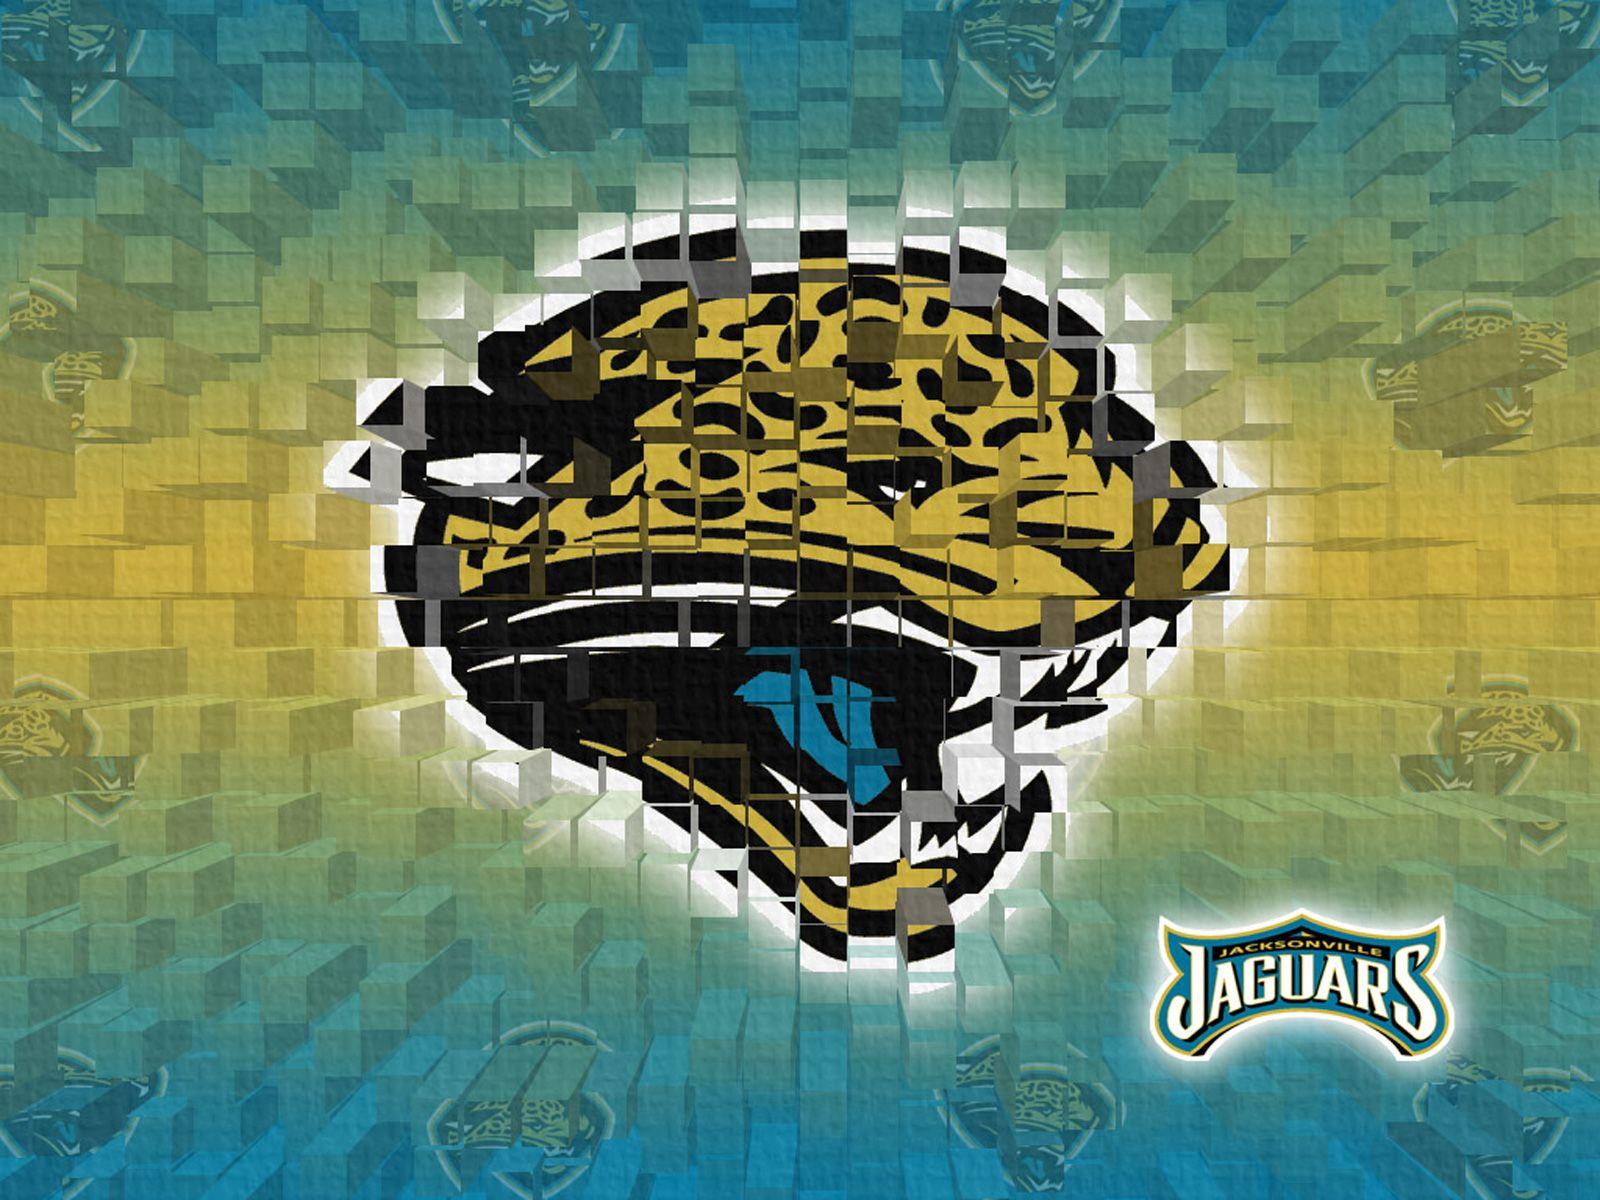 Jacksonville Jaguars 3d Wallpaper Jacksonville Jaguars Jaguar Wallpaper Jaguars